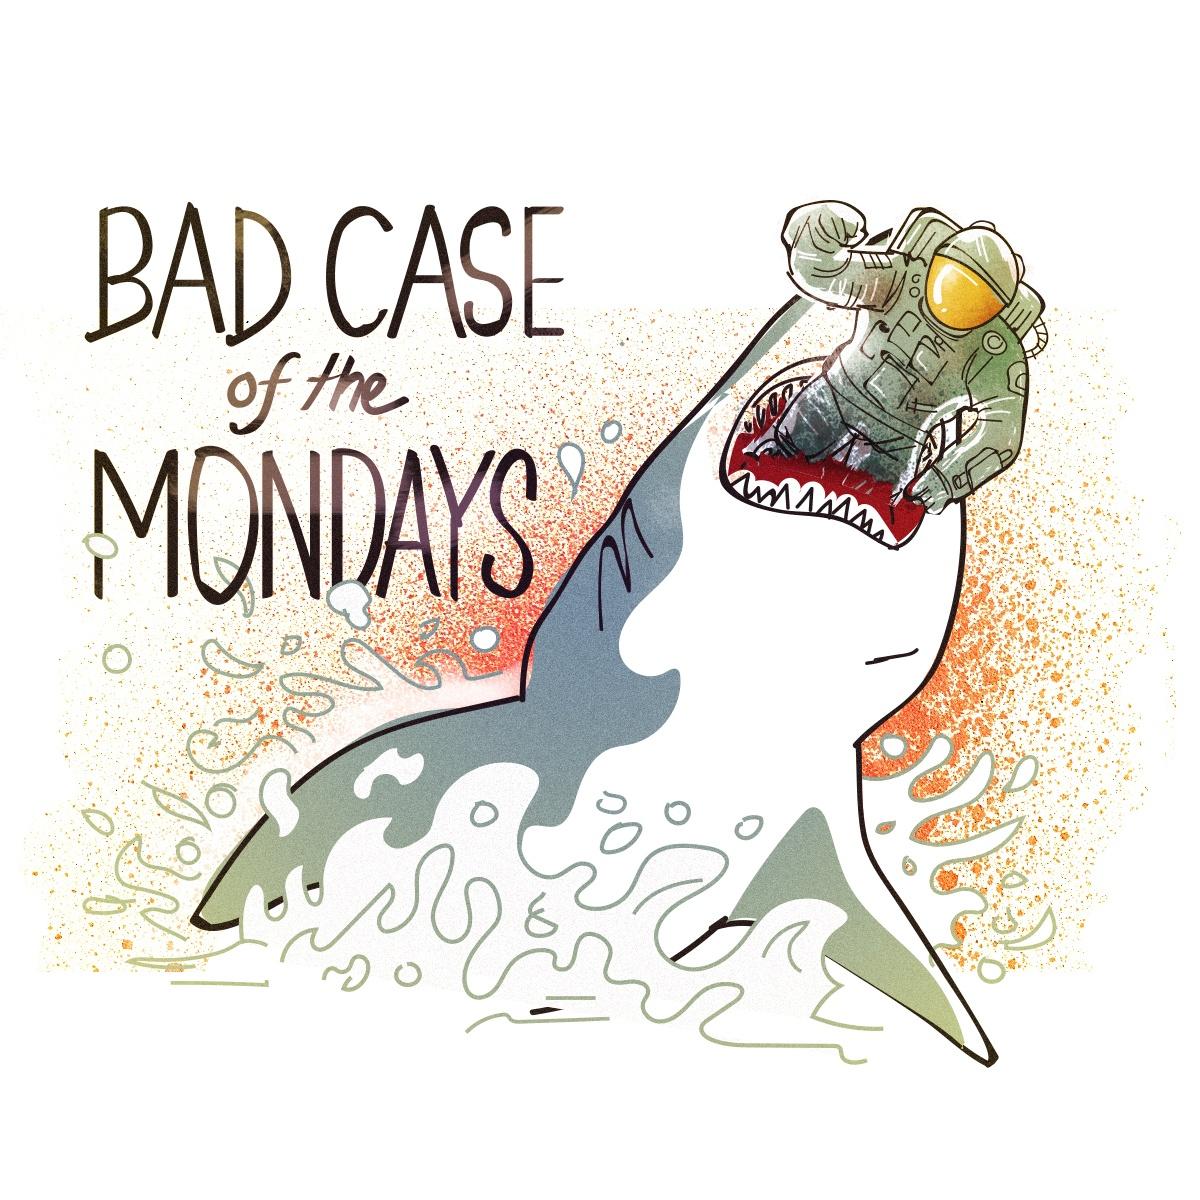 Bad Case of the Mondays